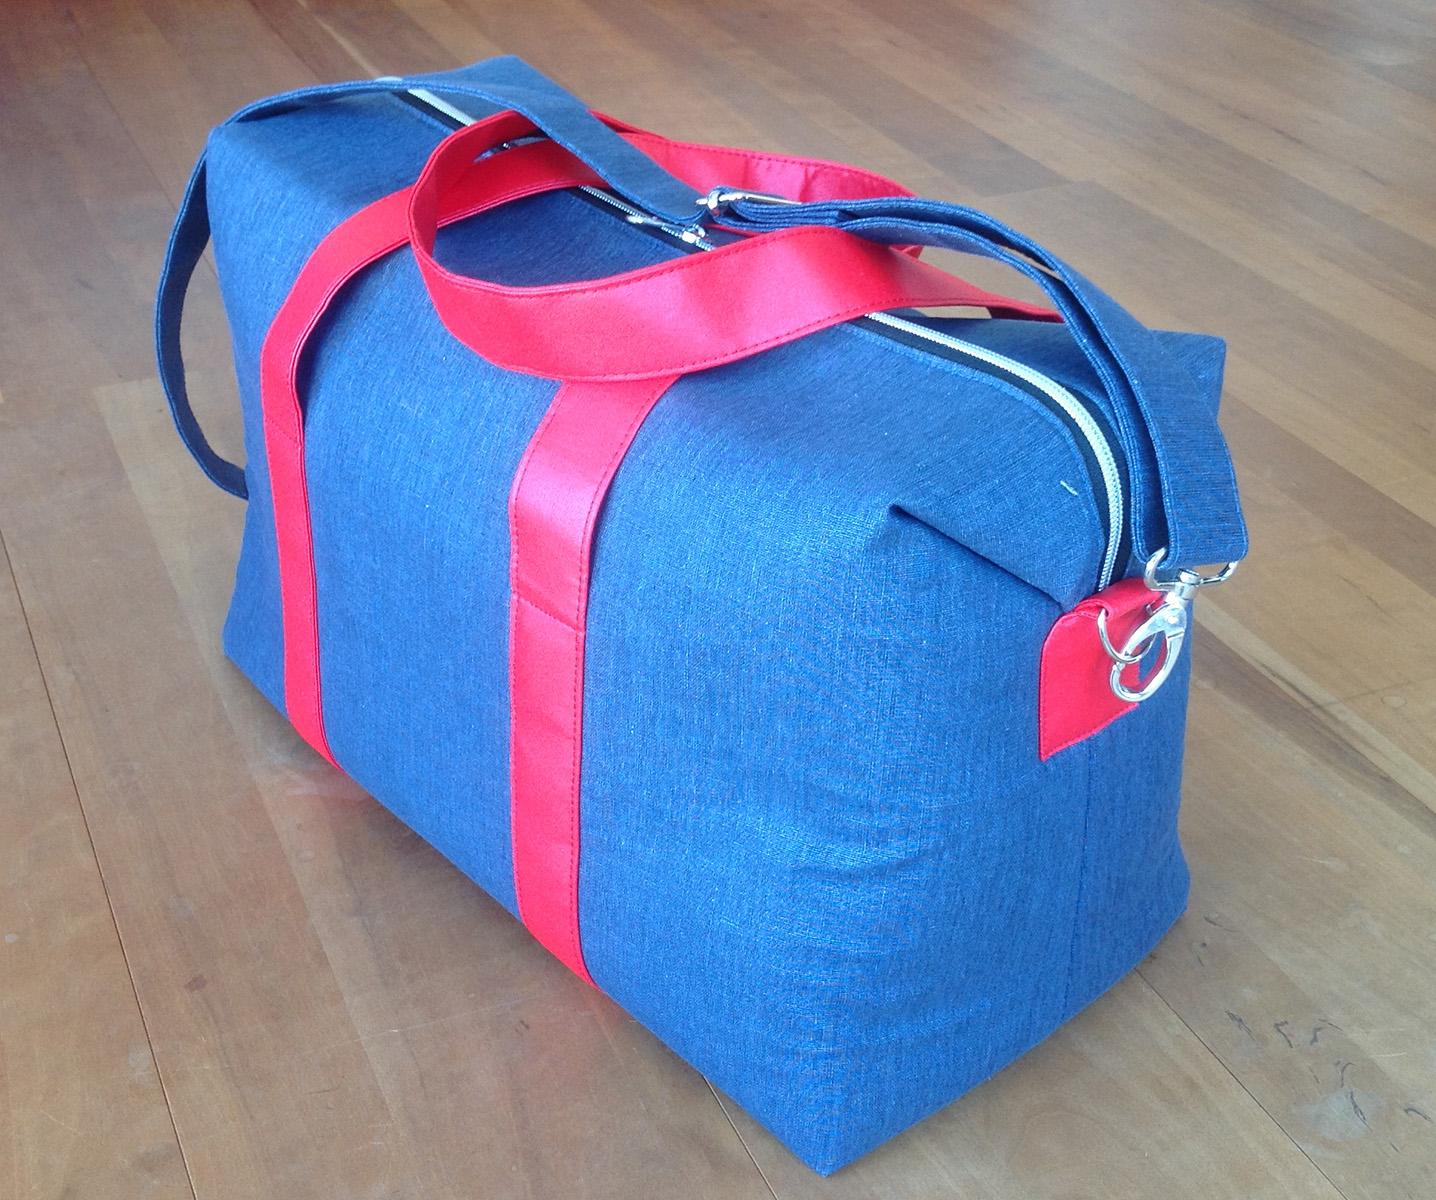 Sew Sweetness Emblem Duffle Bag, sewn by Barbara